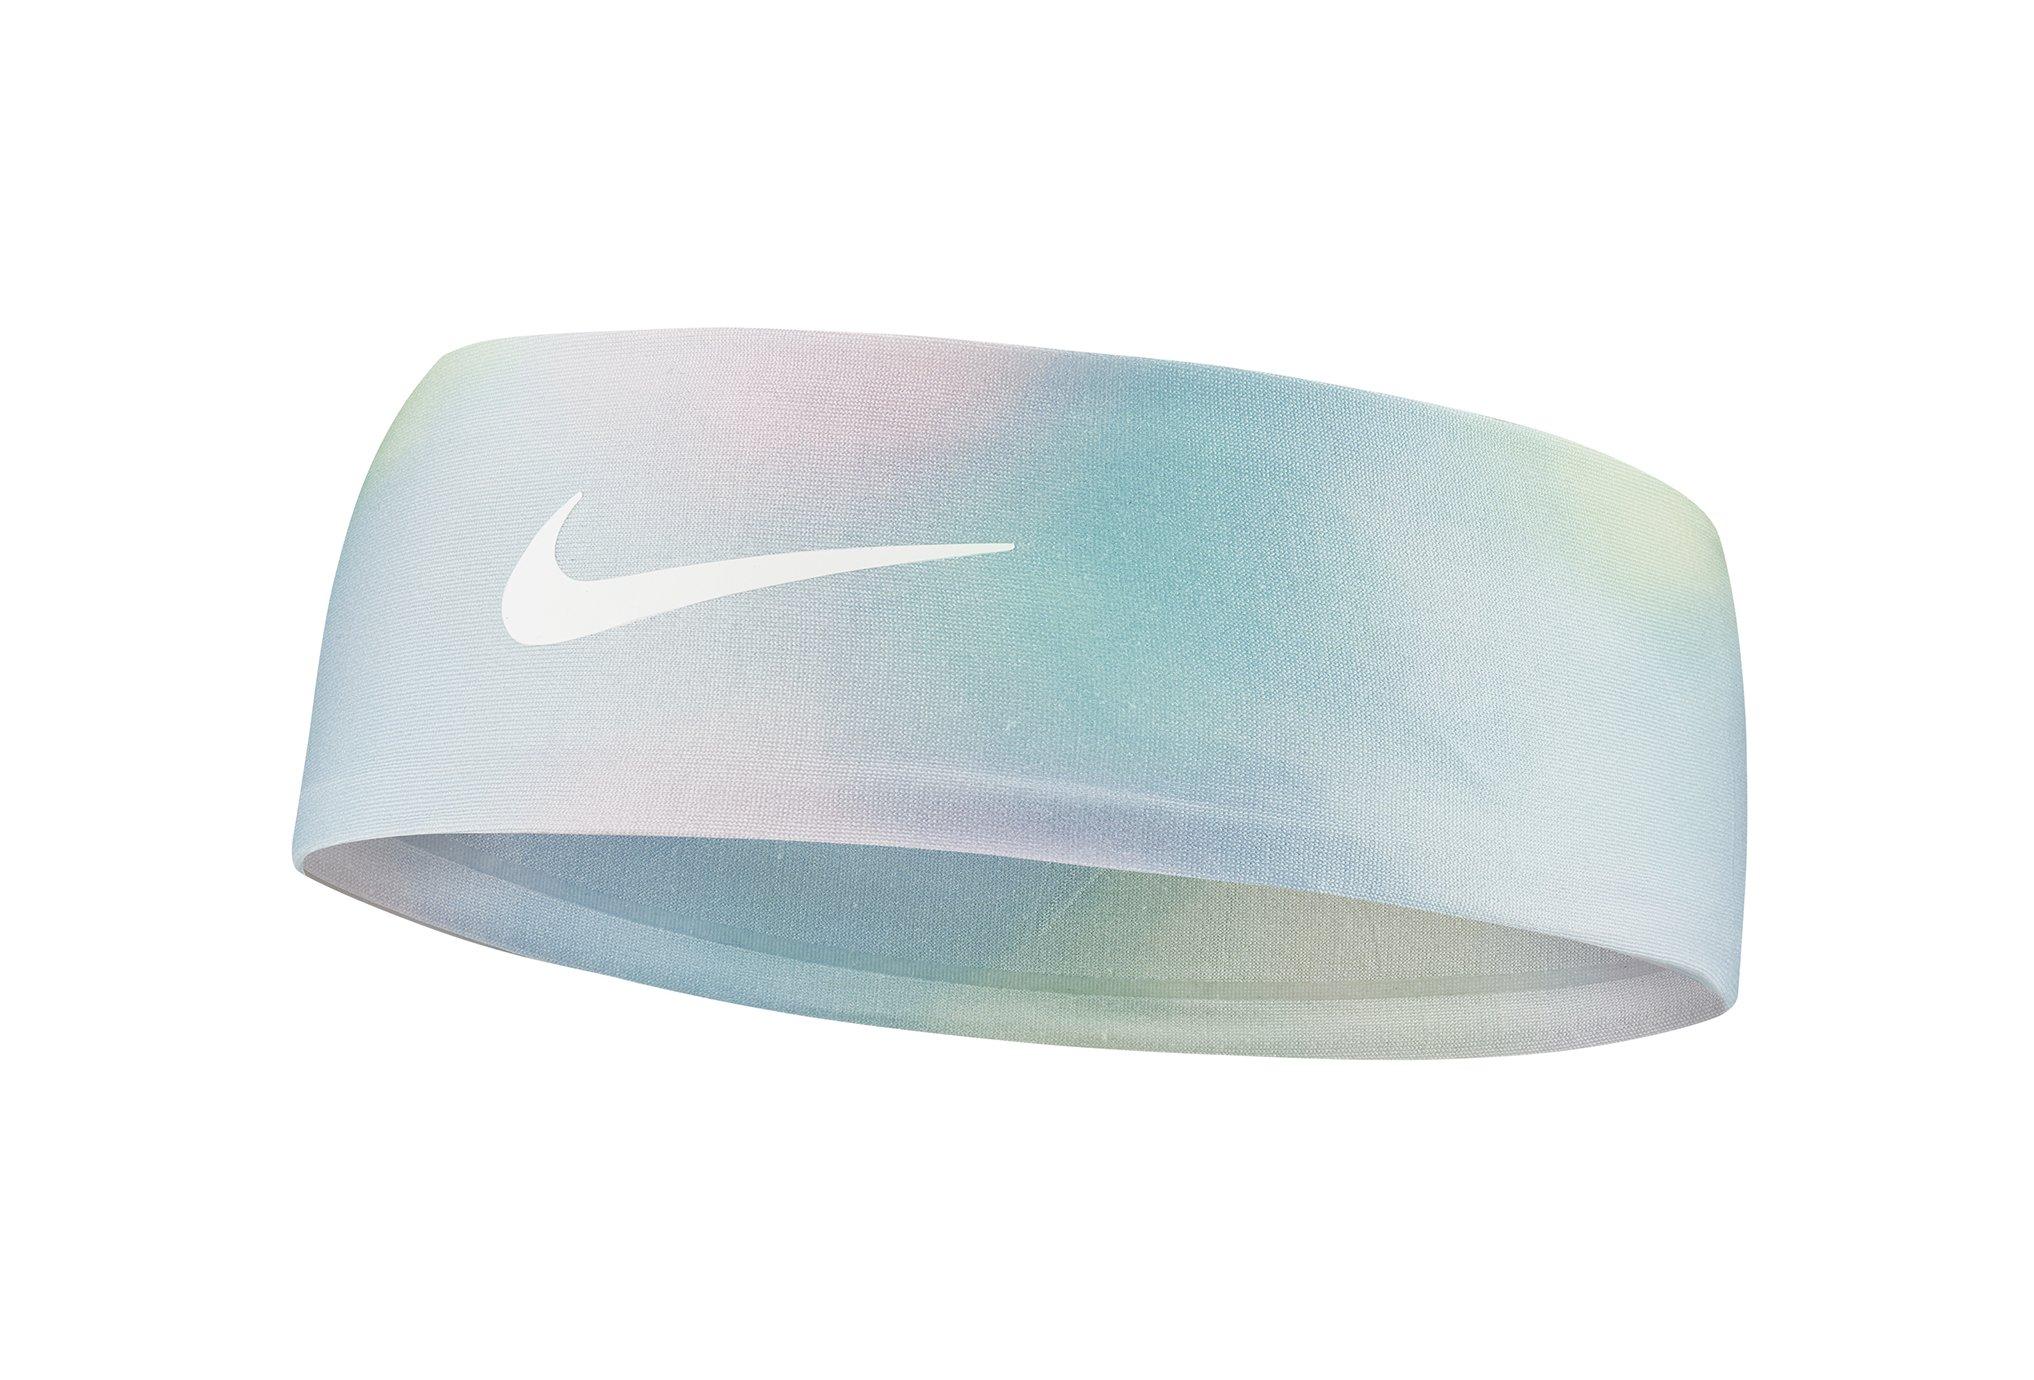 Nike Fury Headband 3.0 Casquettes / bandeaux